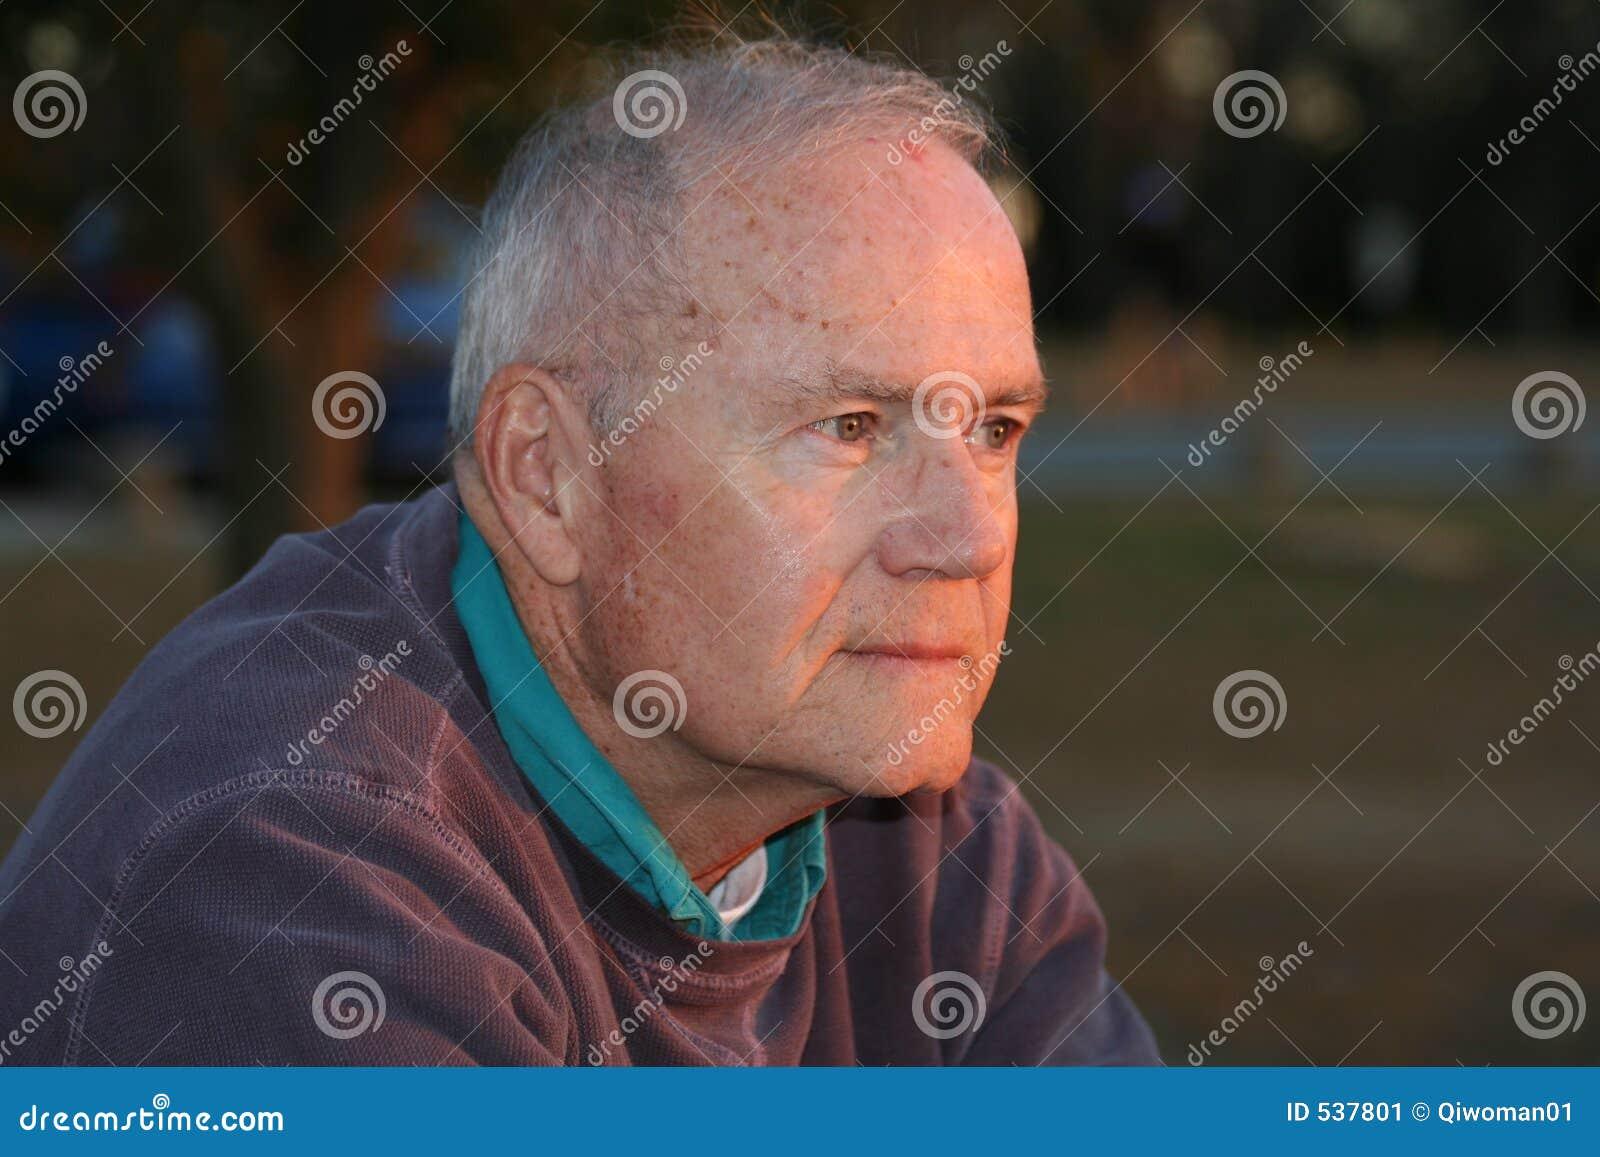 Download 时候反映 库存图片. 图片 包括有 唯一, 中间, 祖父, 退休, 周道, 高级, 灰色, 绅士, 内存, 反映 - 537801